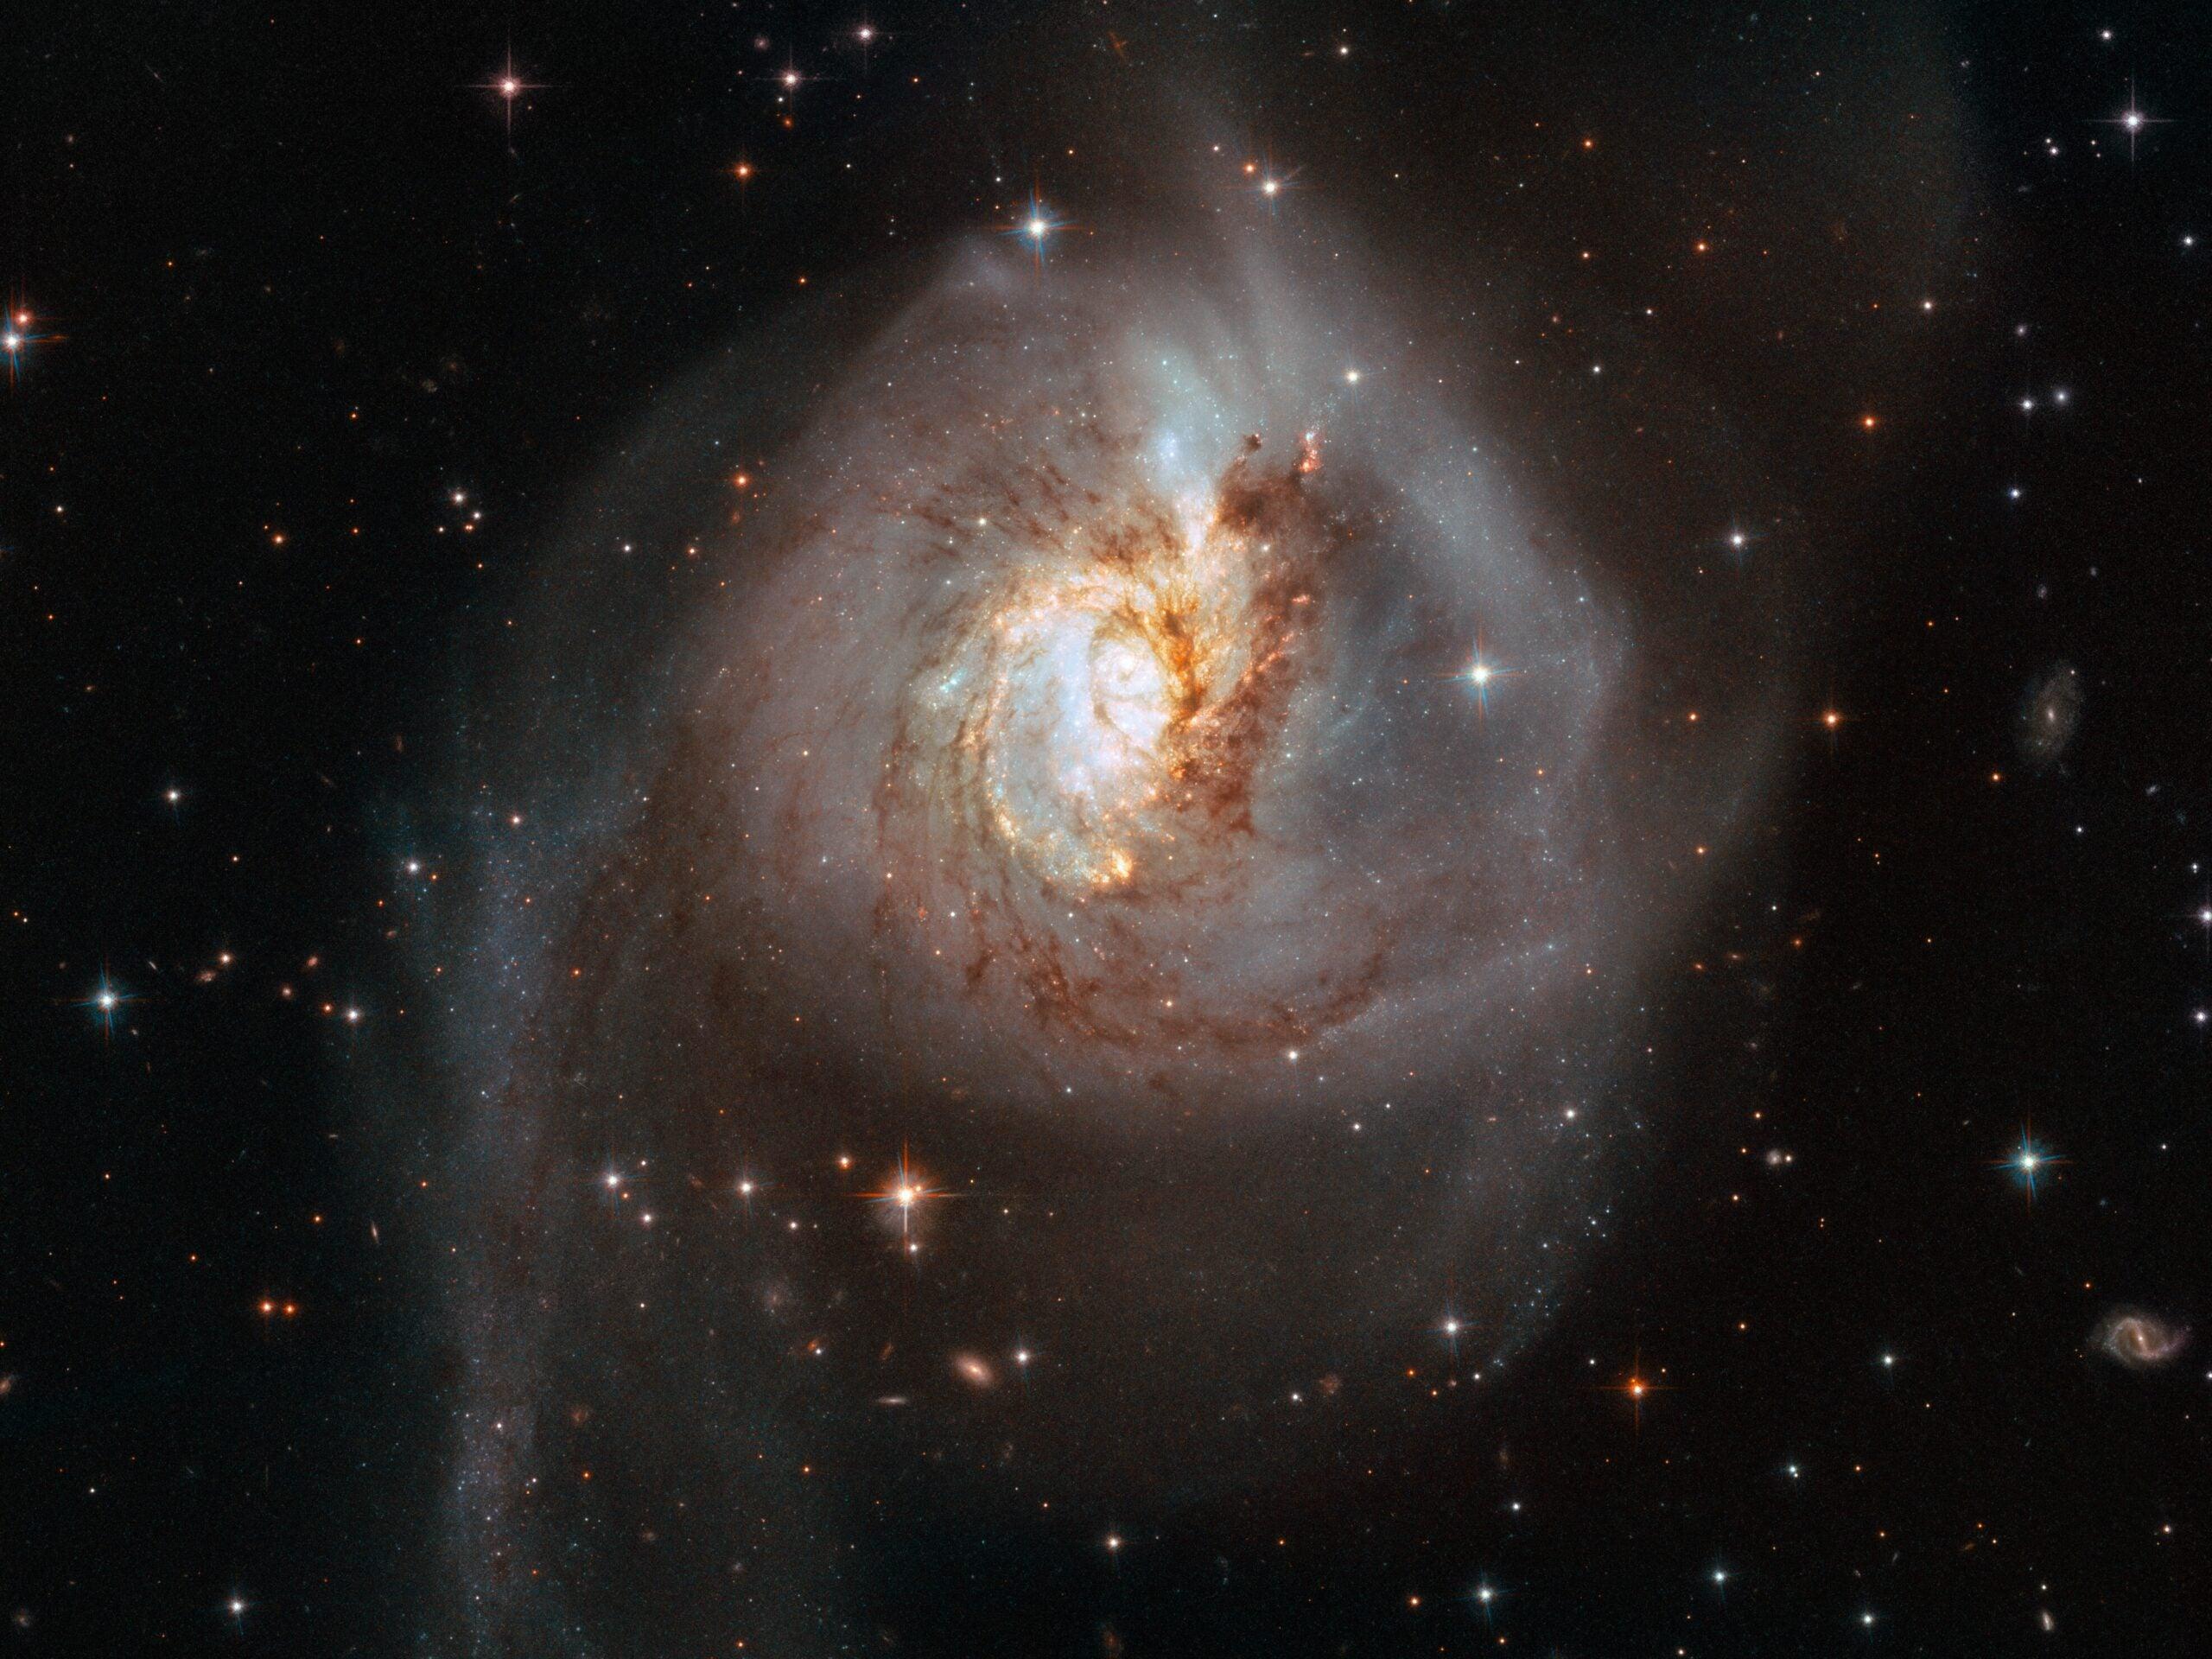 Interacting galaxies seen among stars through a telescope